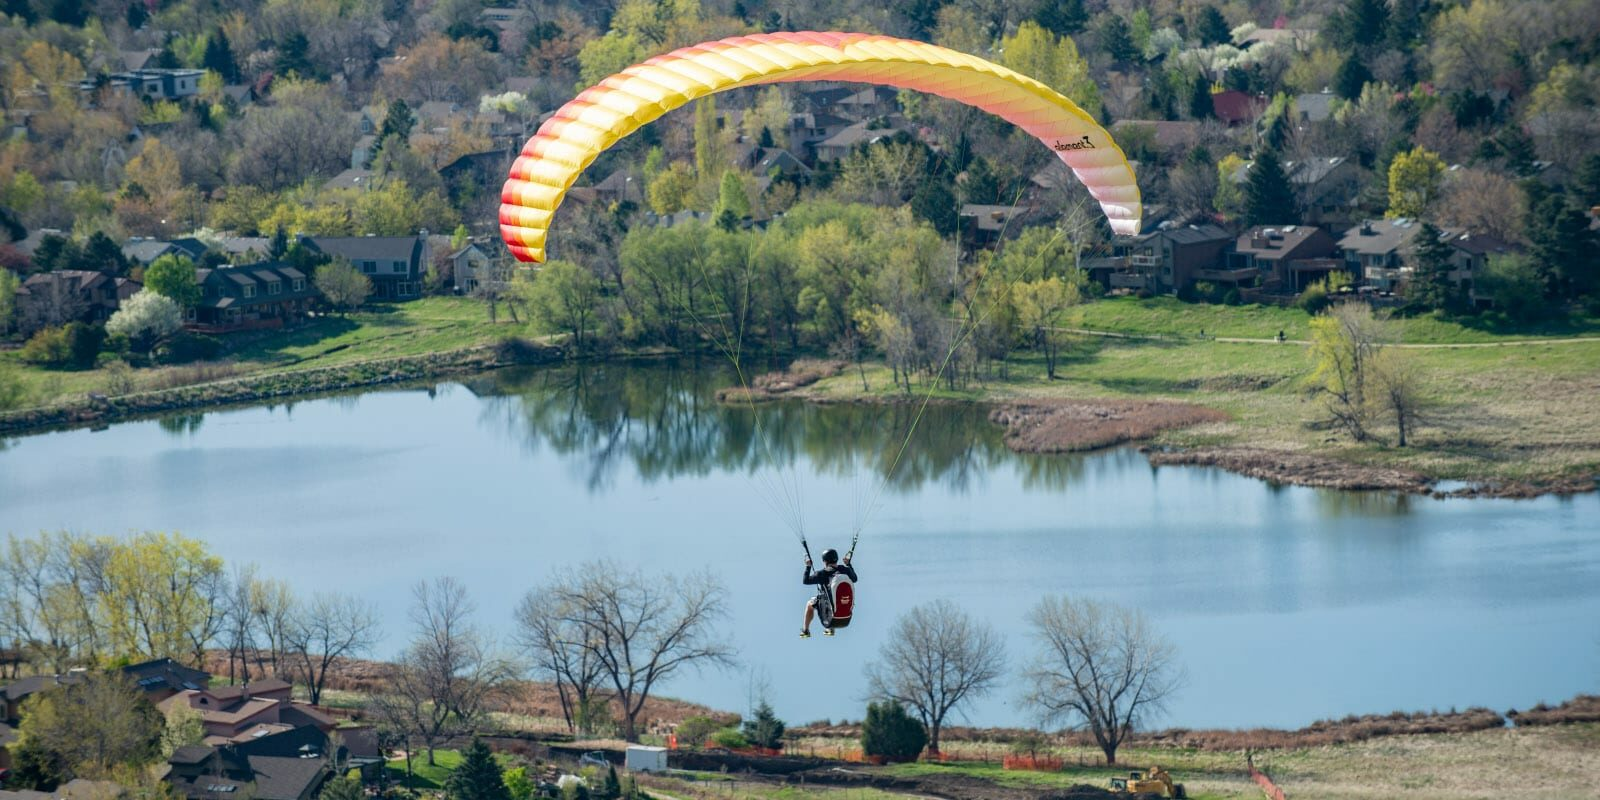 Red Tail Paragliding Boulder Colorado